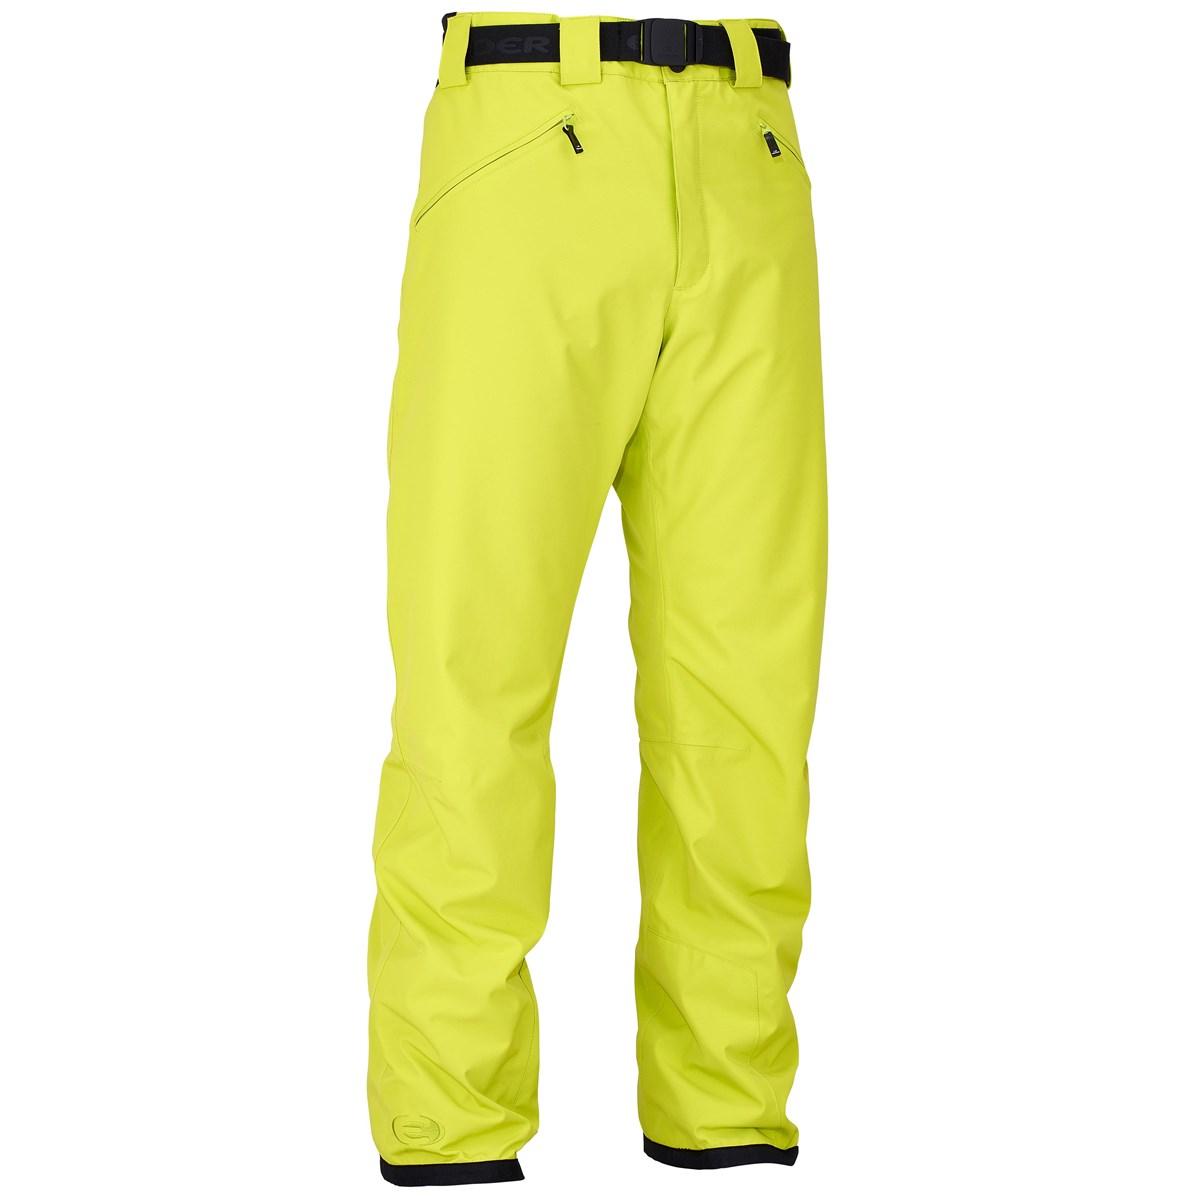 a8f829958 Eider Alta Badia Mens Ski Pants in Lime